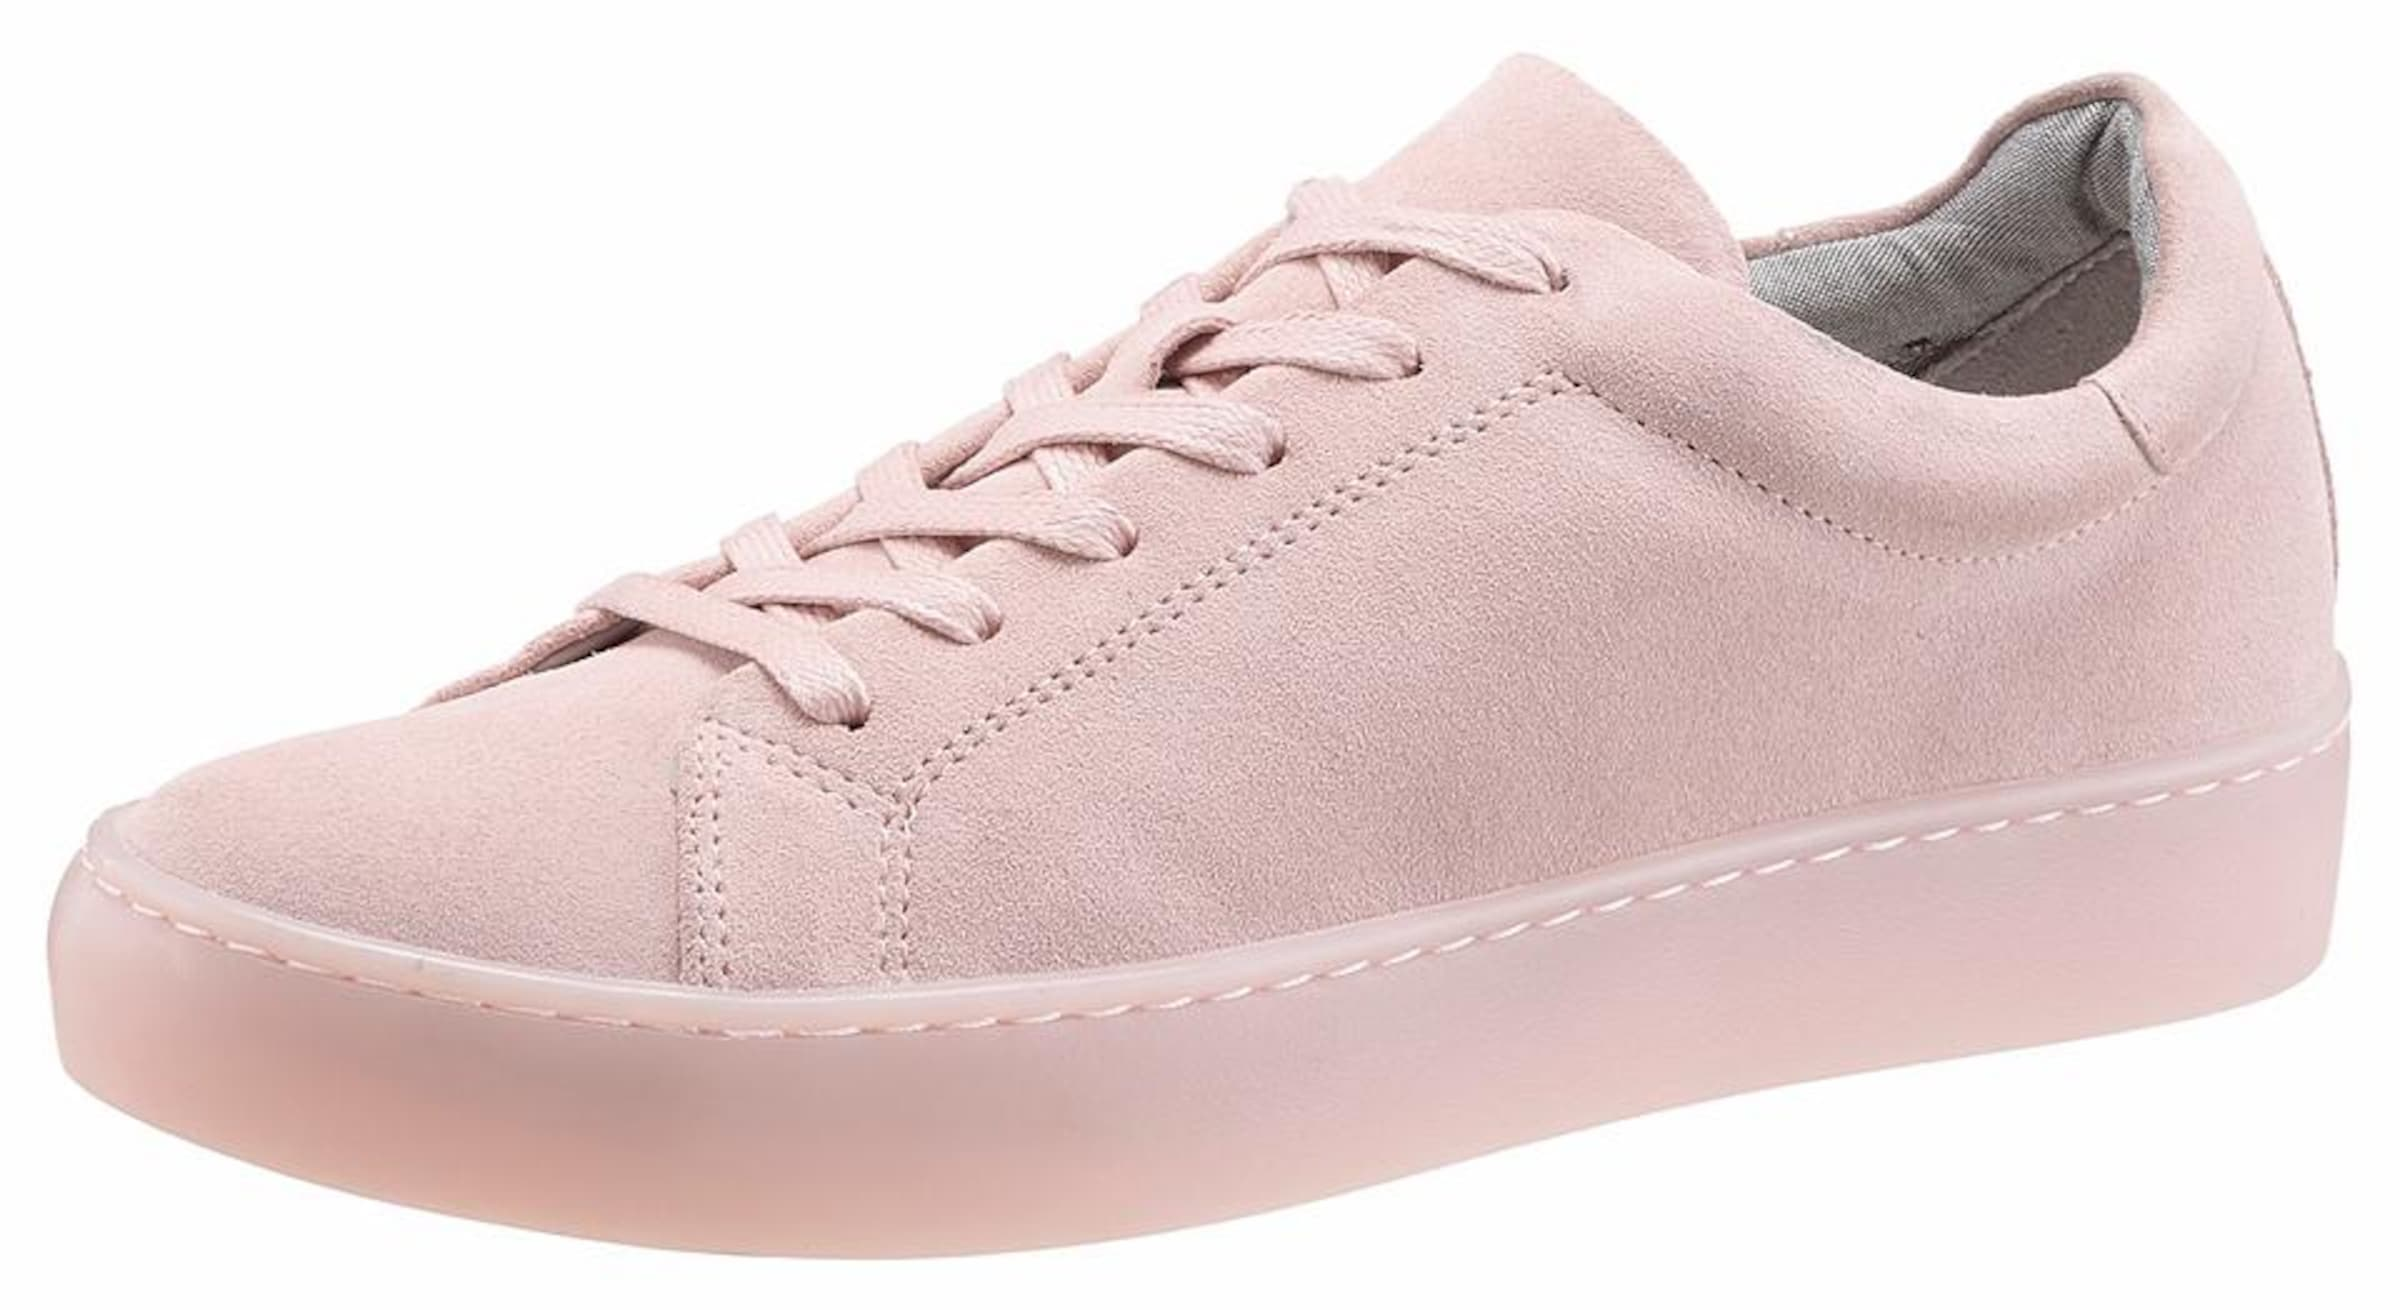 VAGABOND SHOEMAKERS Vagabond Sneaker Modisch 9Hl07X